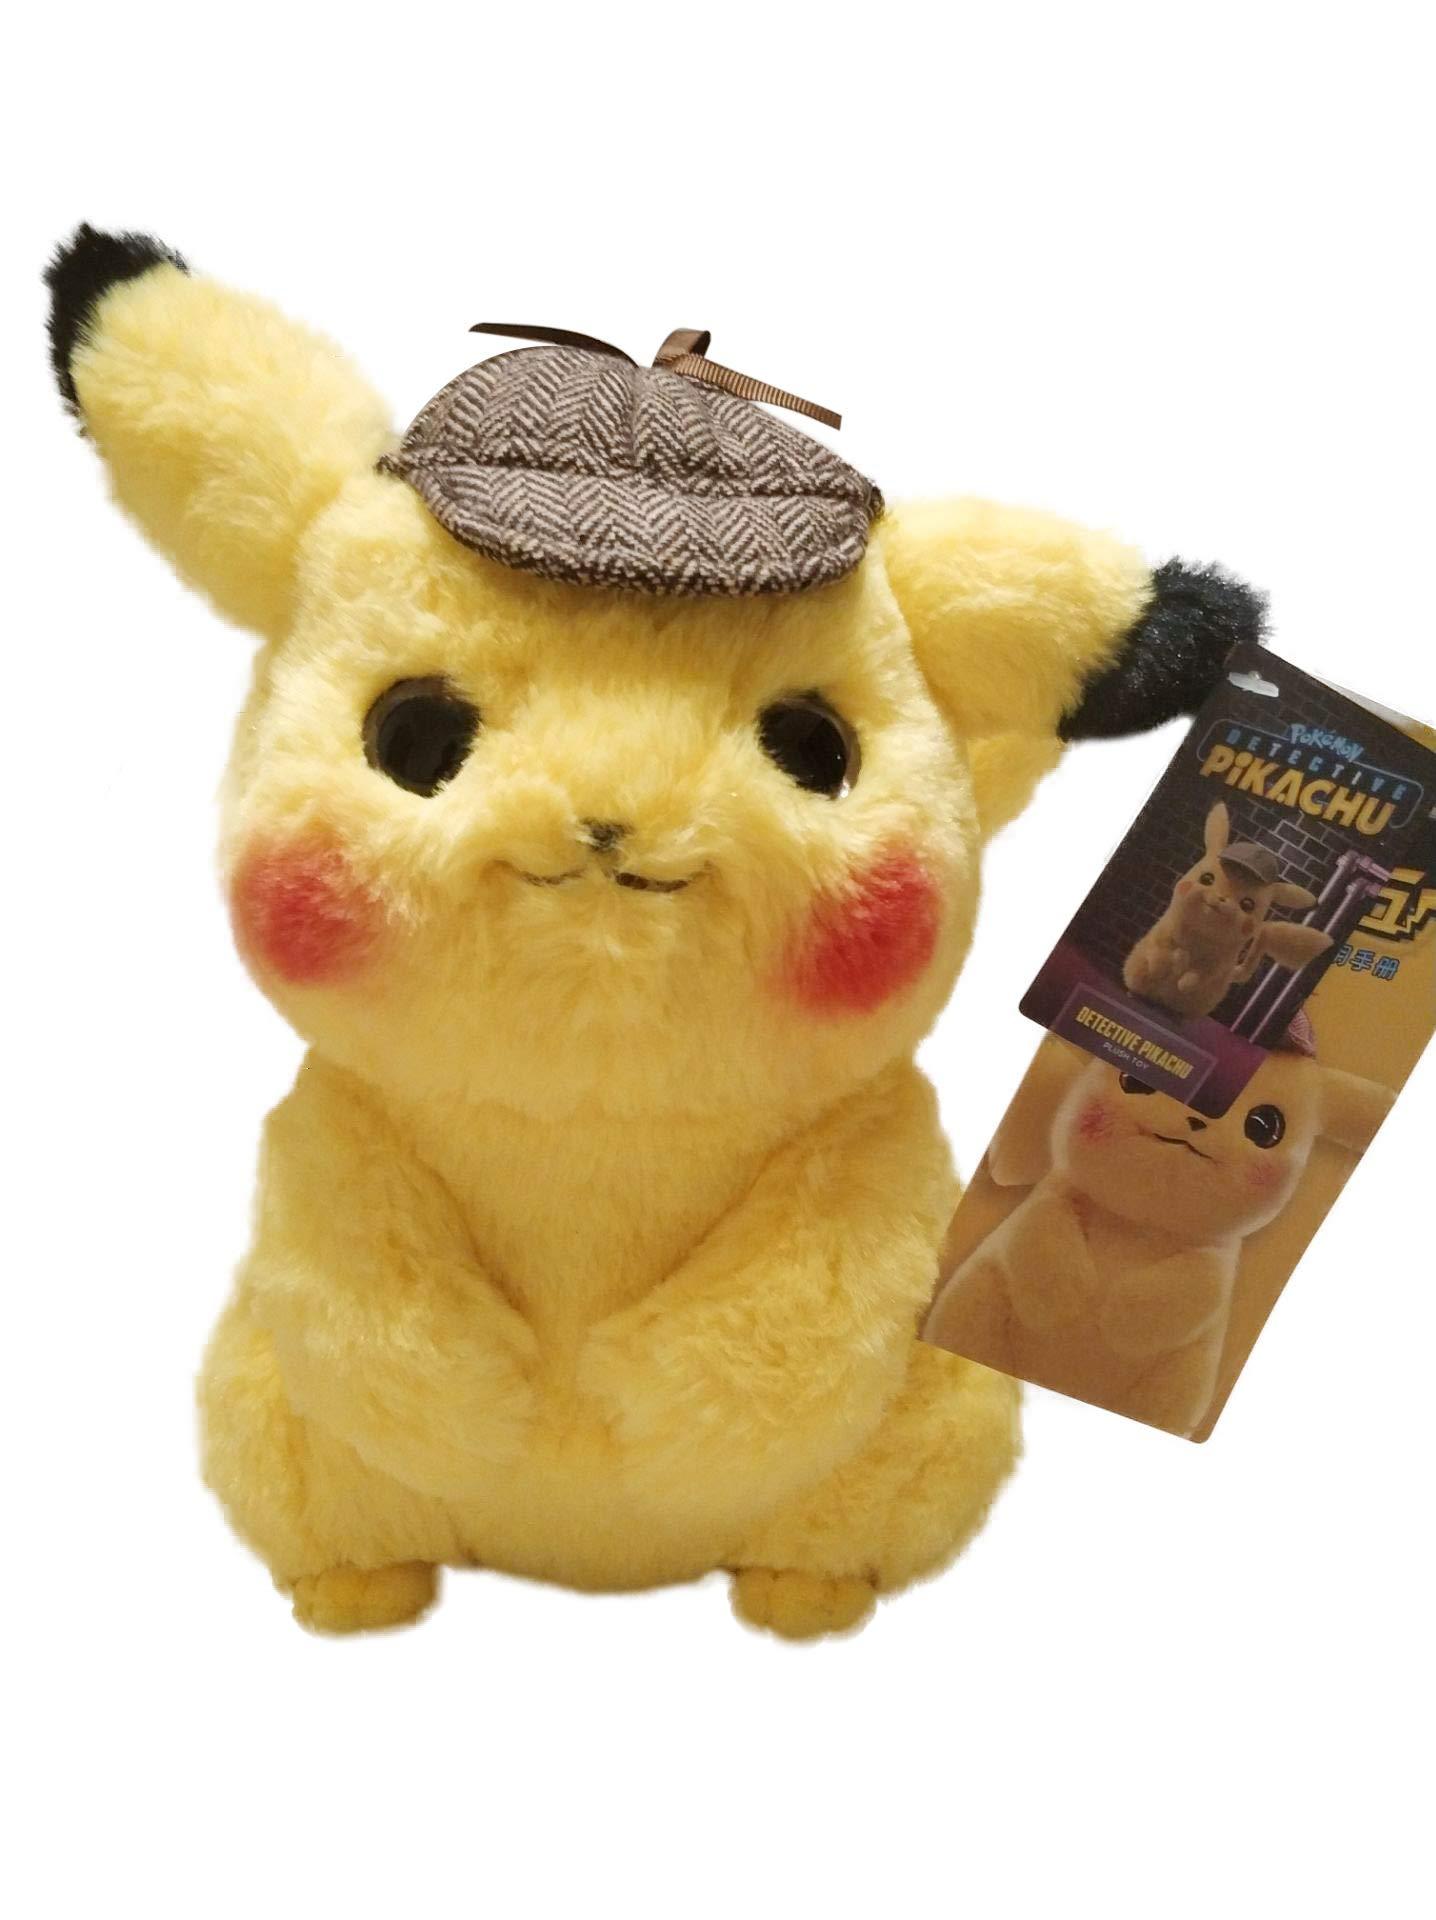 detective pikachu plush toy